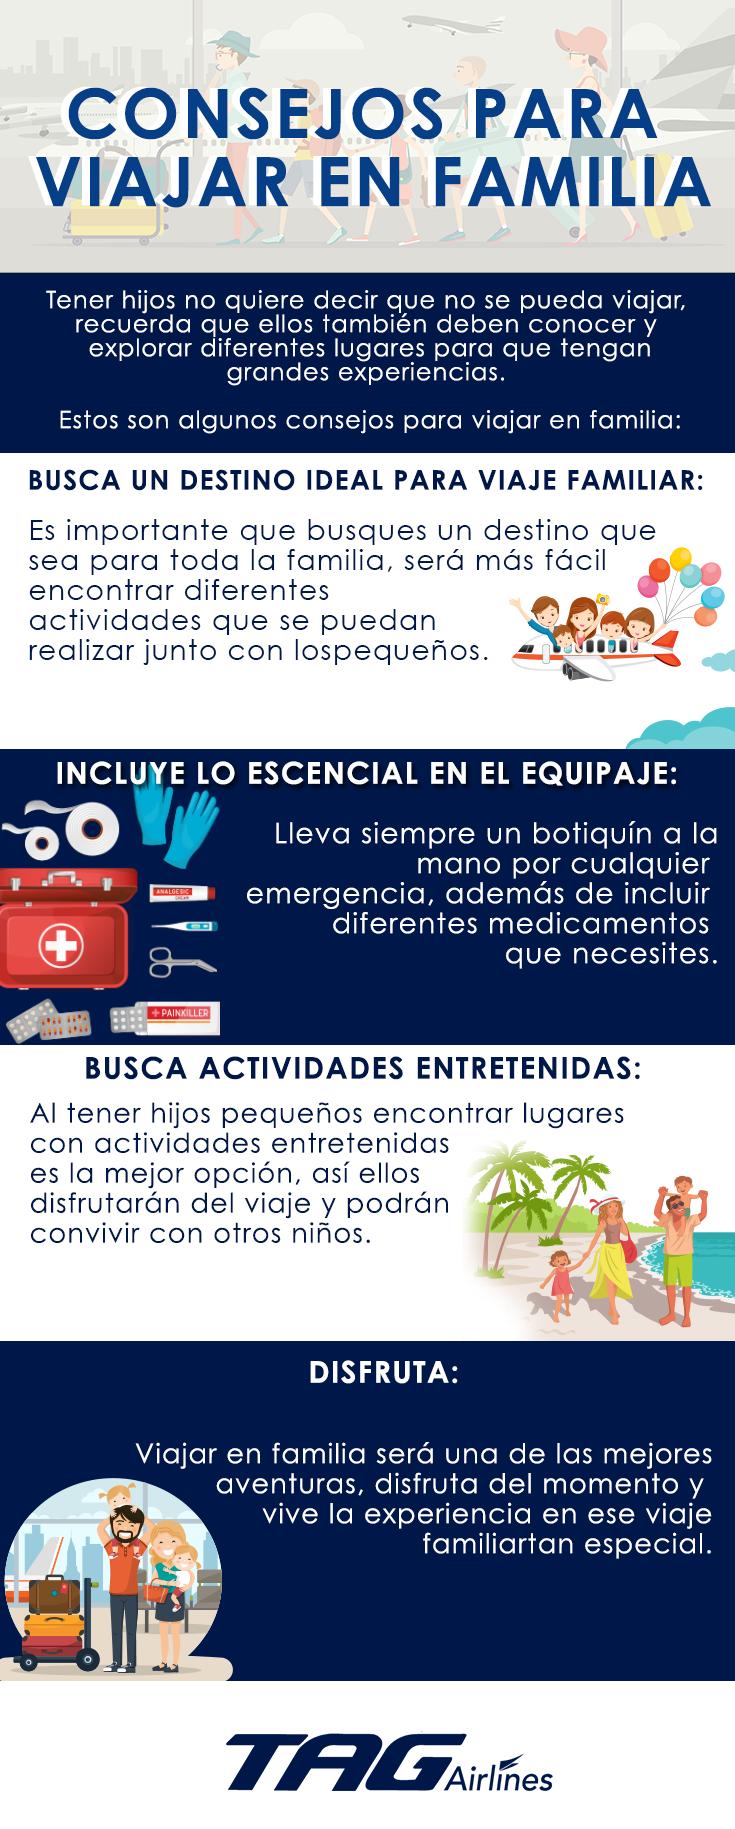 infografia-tag-consejos-para-viajar-en-familia